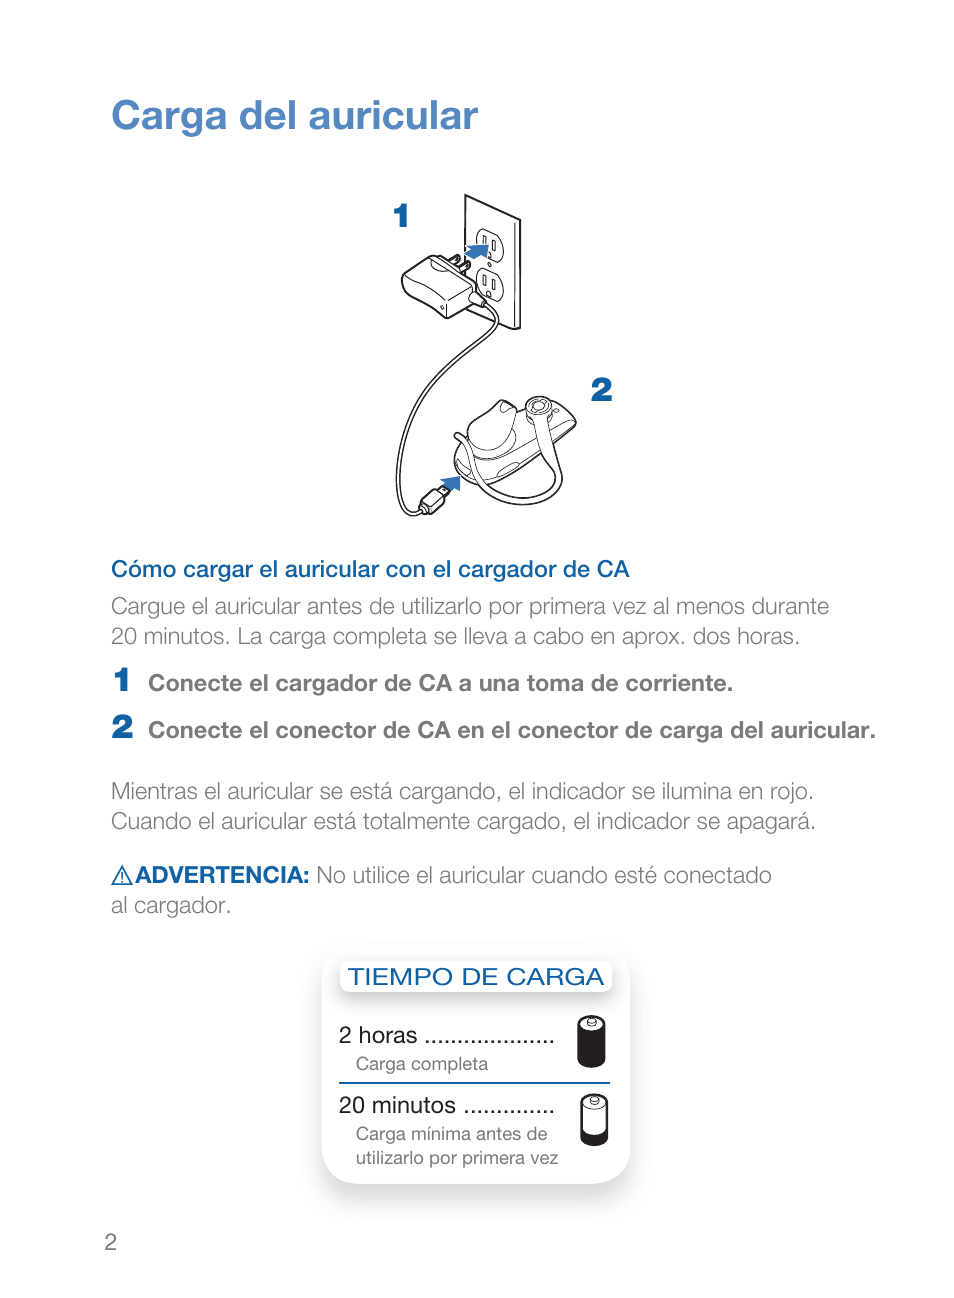 carga del auricular plantronics explorer 230 manual del usuario rh pdfmanuales com plantronics explorer 230 user manual Manual Panasonic Radio